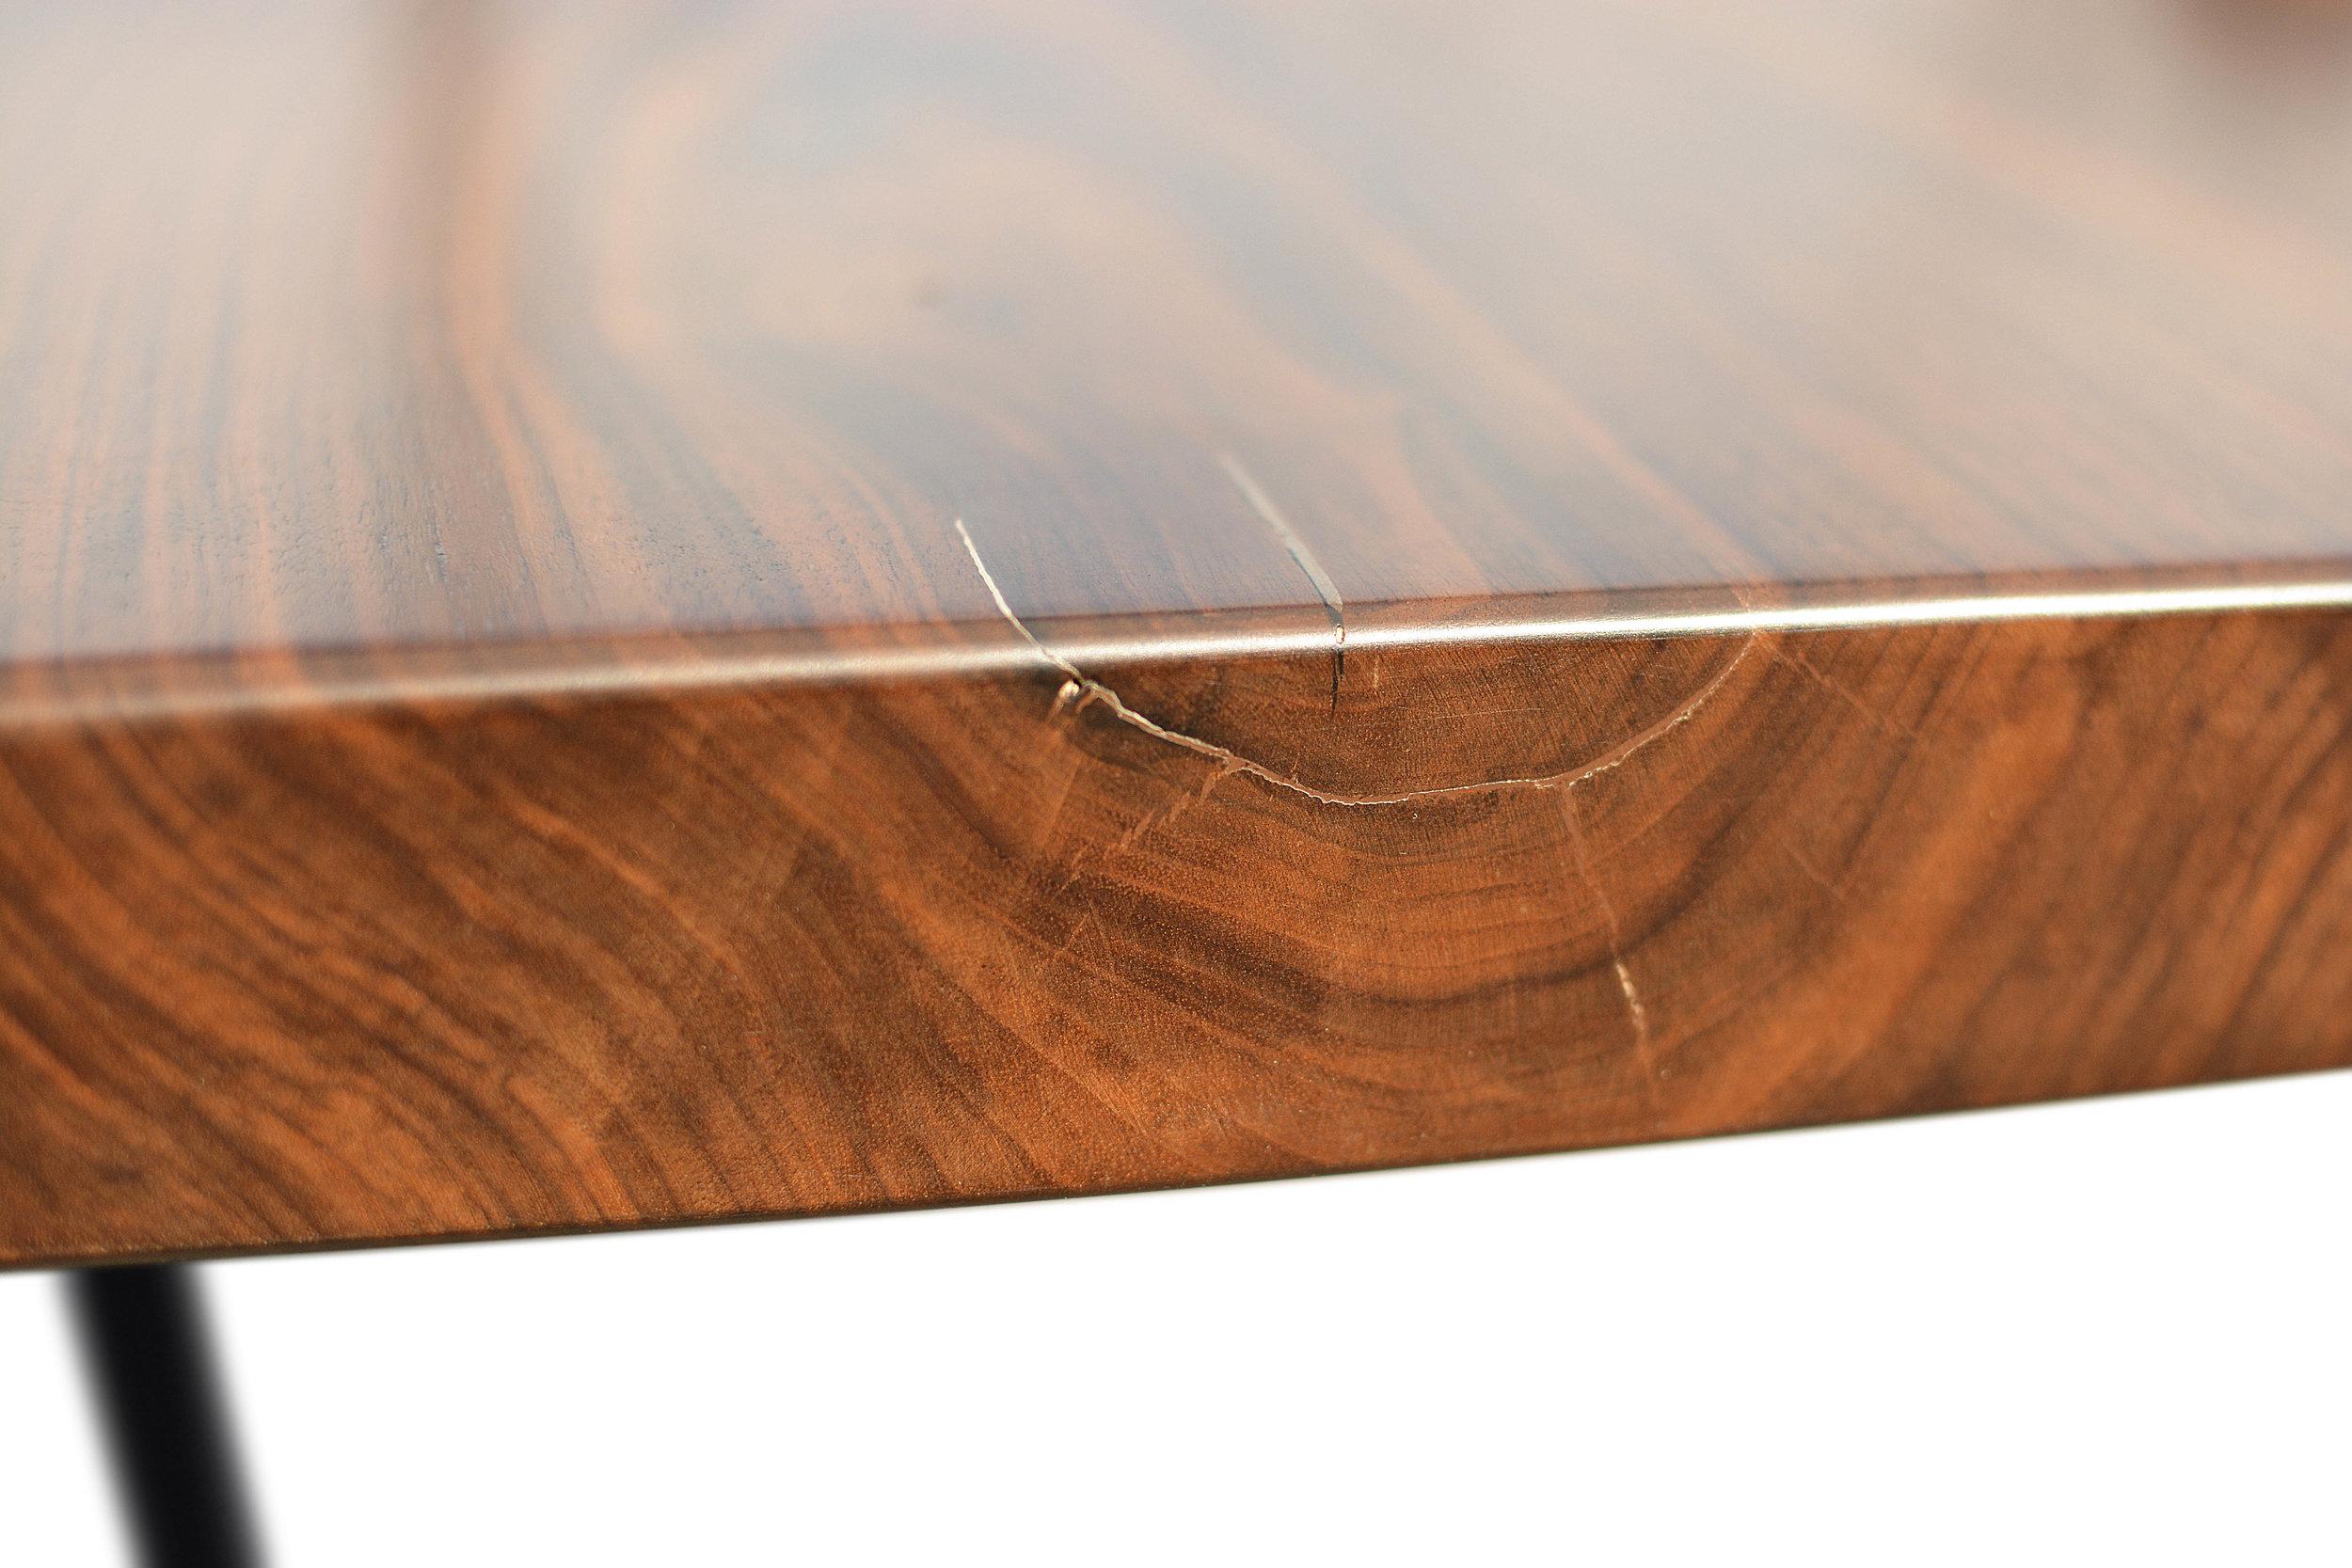 Etz & Steel Hermes Live Edge Walnut Table Close Up 4.JPG